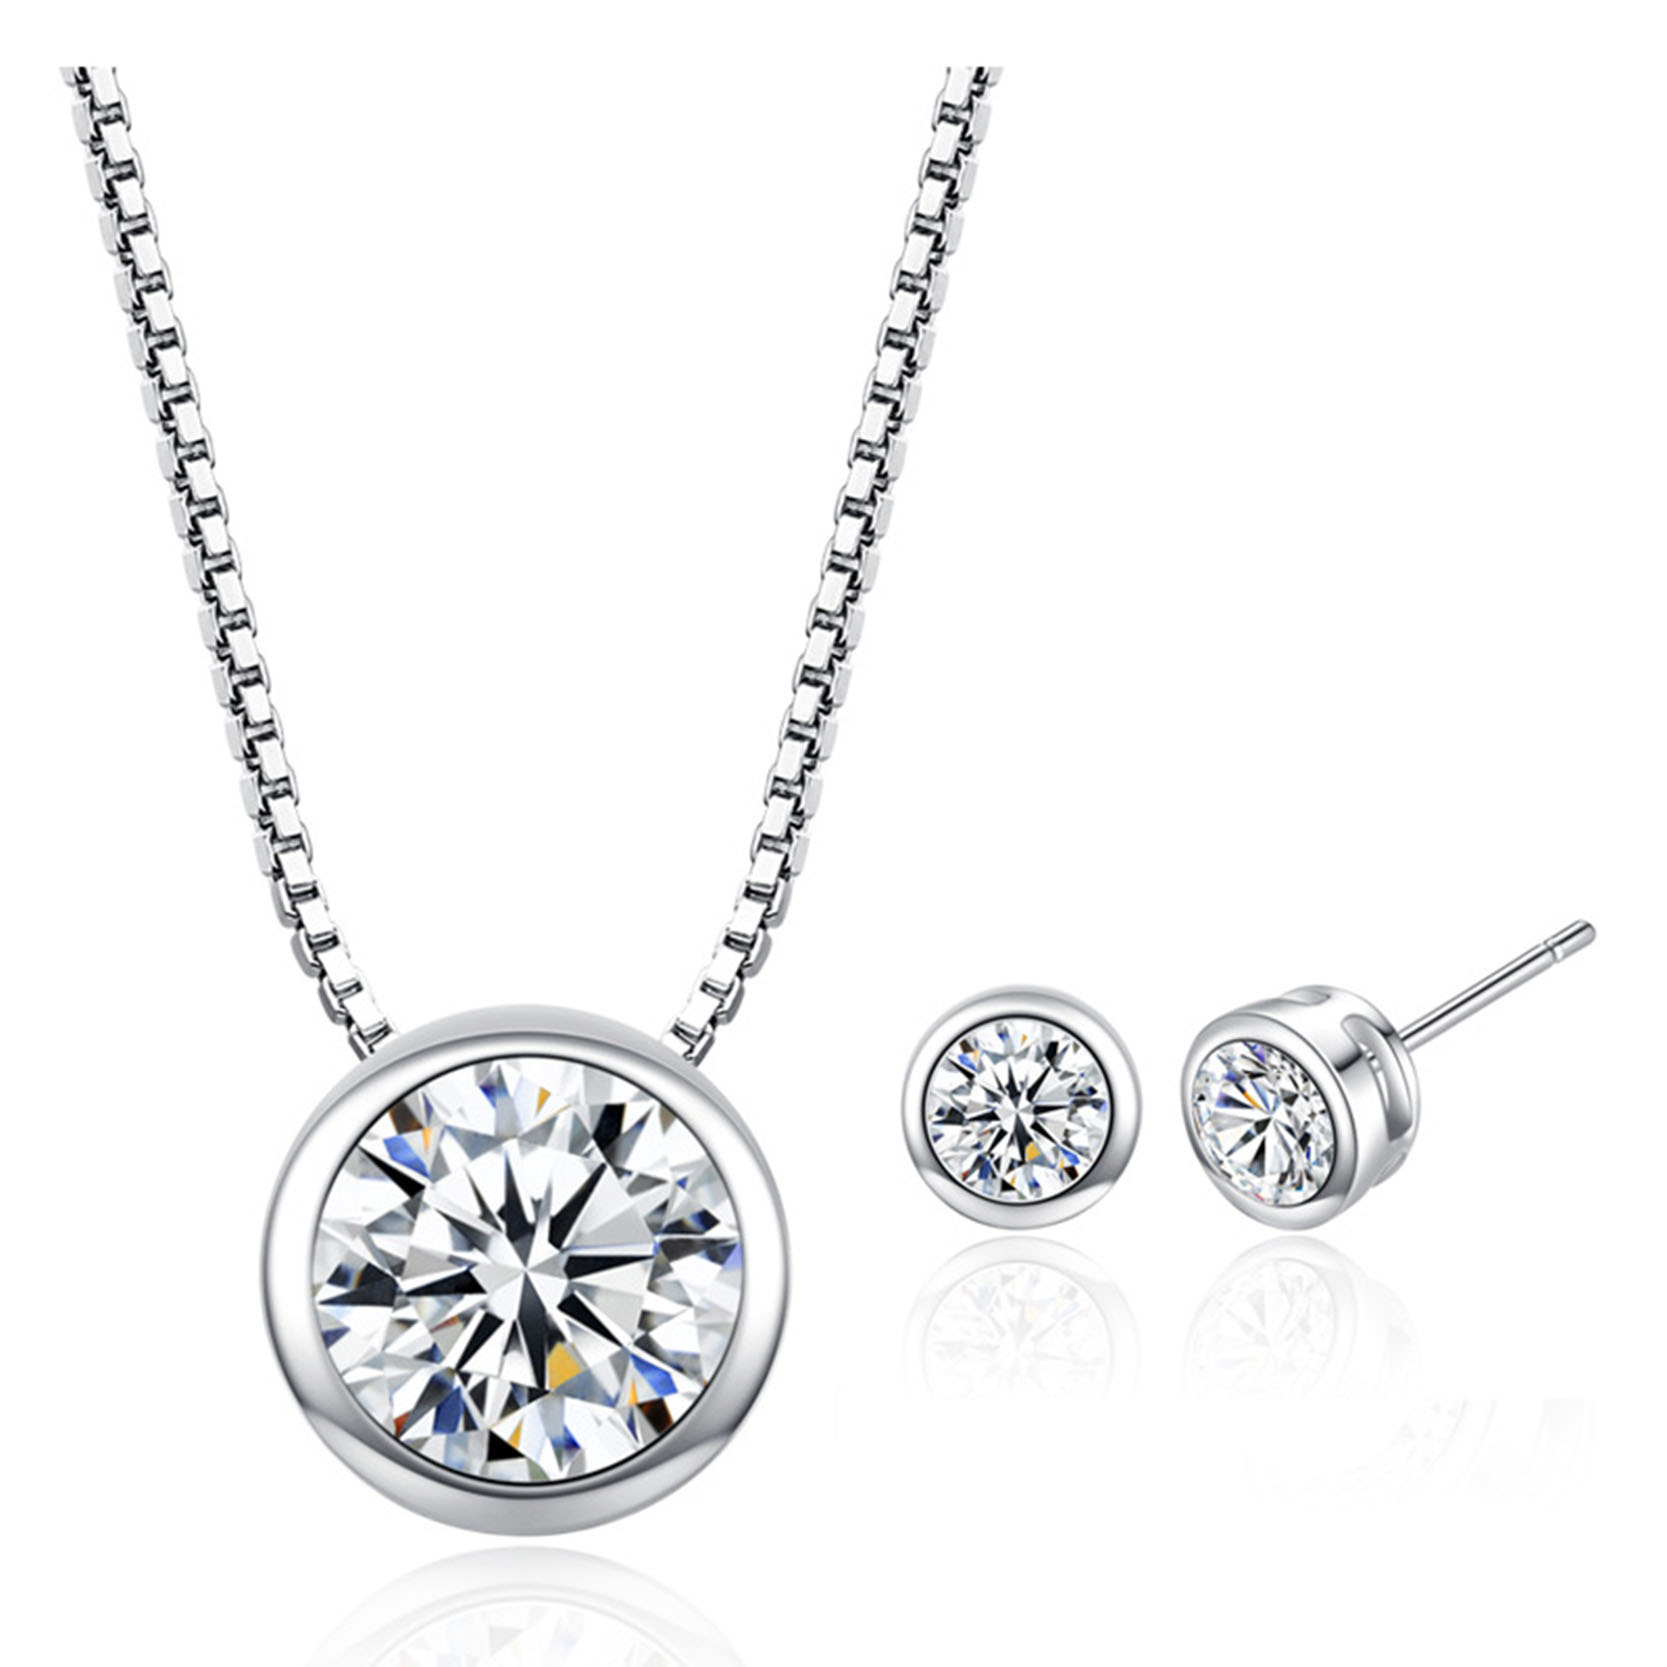 Pink CZ Zircon Stone Silver Jewelry Set for Women Wedding Engagement Choker Necklace Stud Earrings font